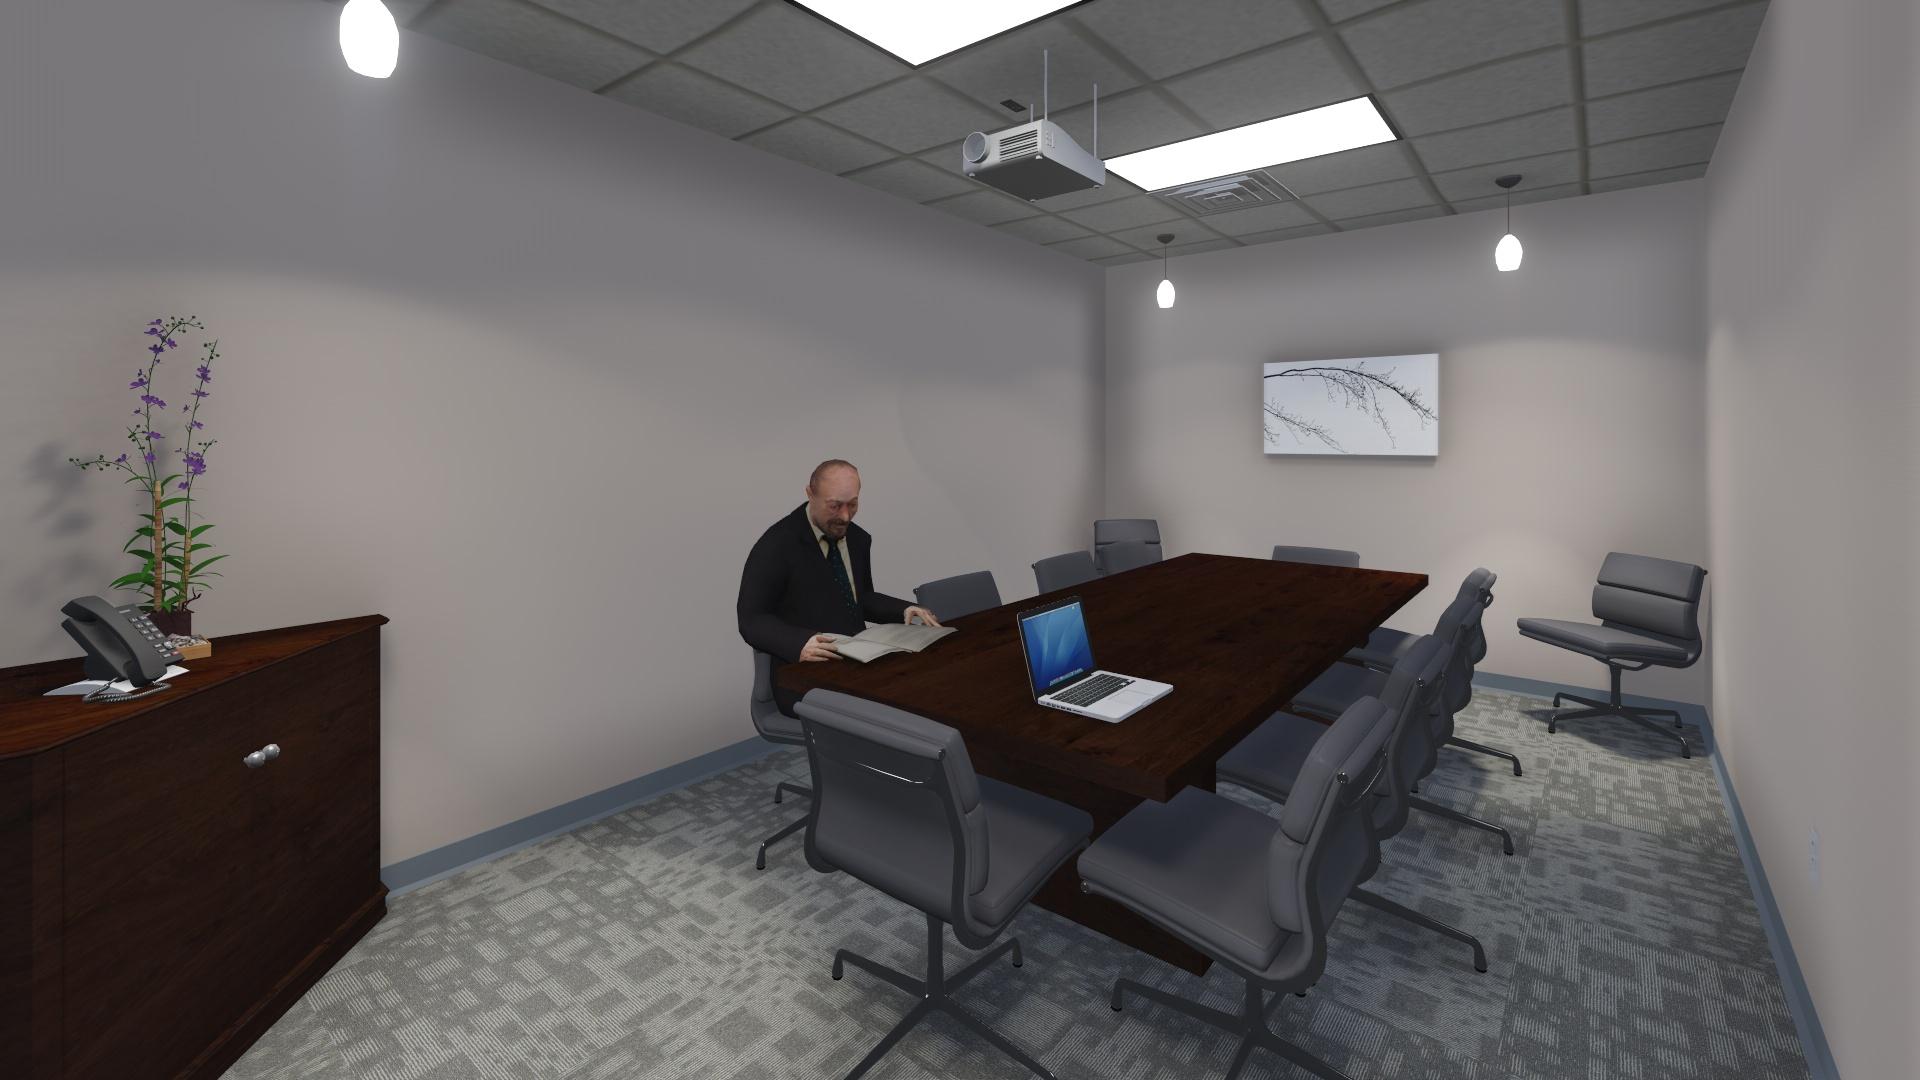 27 MAR 14 - OFFICE RENDERING - CONFERENCE ROOM.jpg